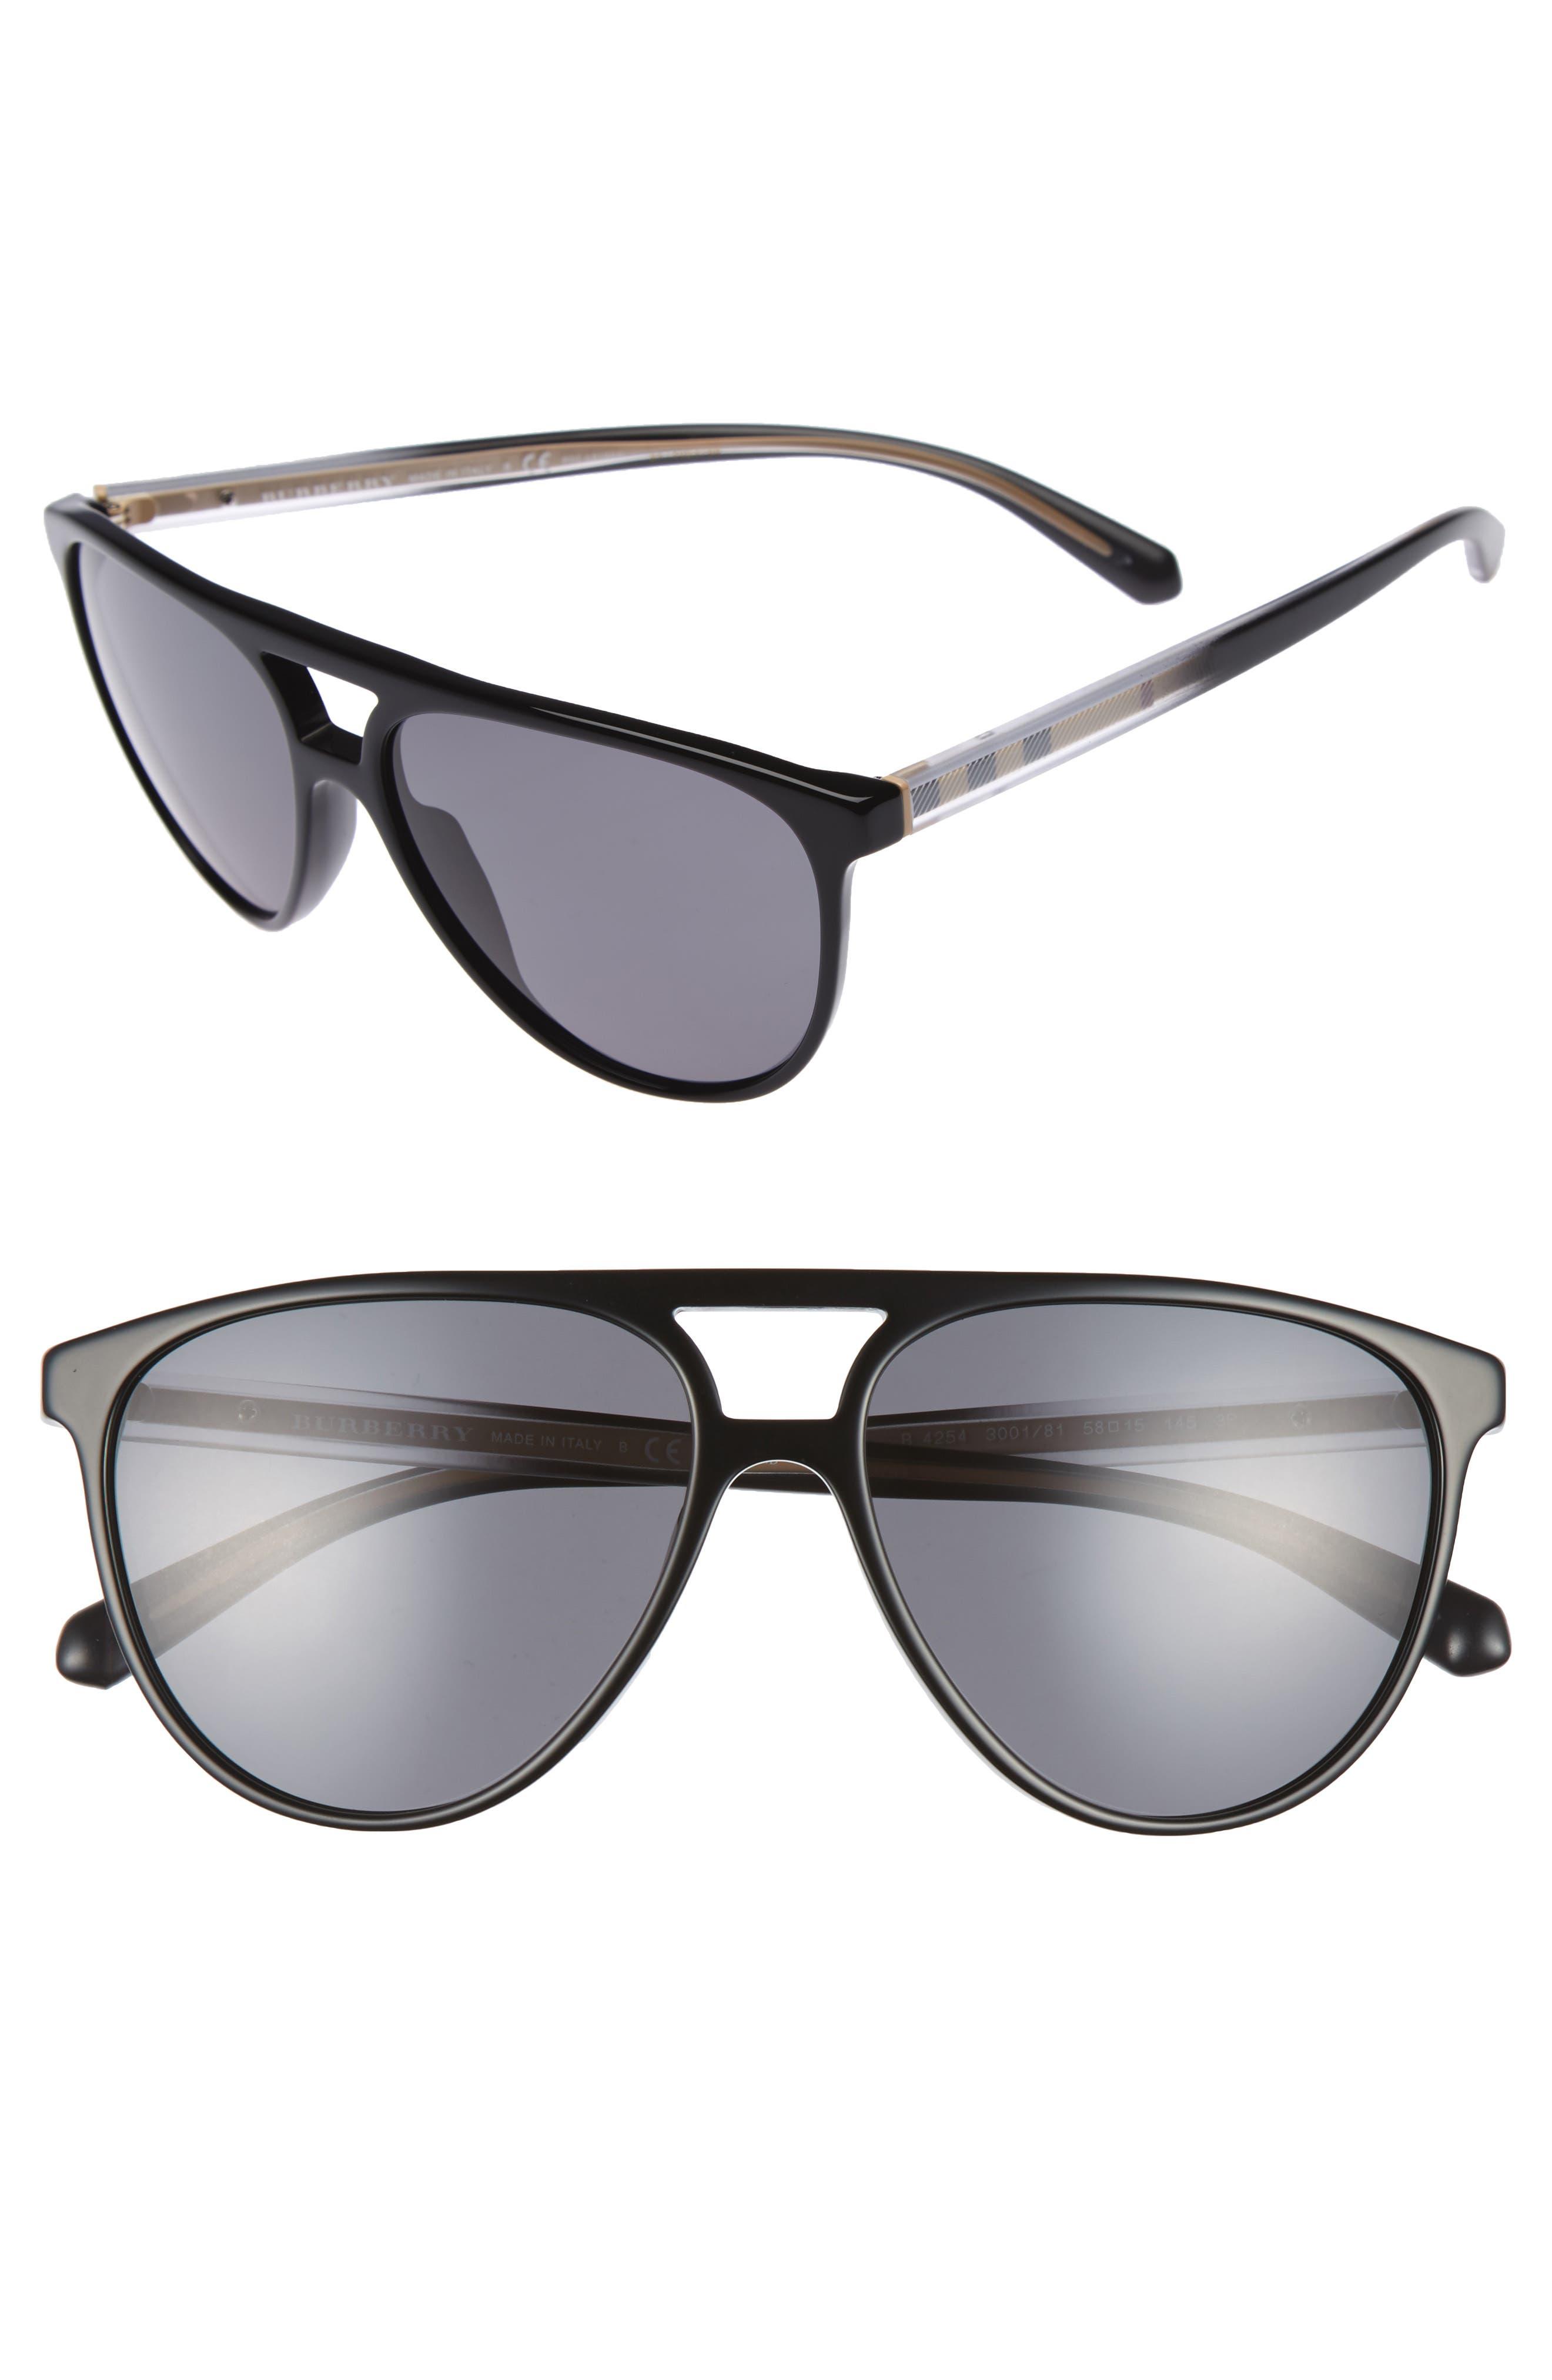 58mm Polarized Aviator Sunglasses,                         Main,                         color, 001